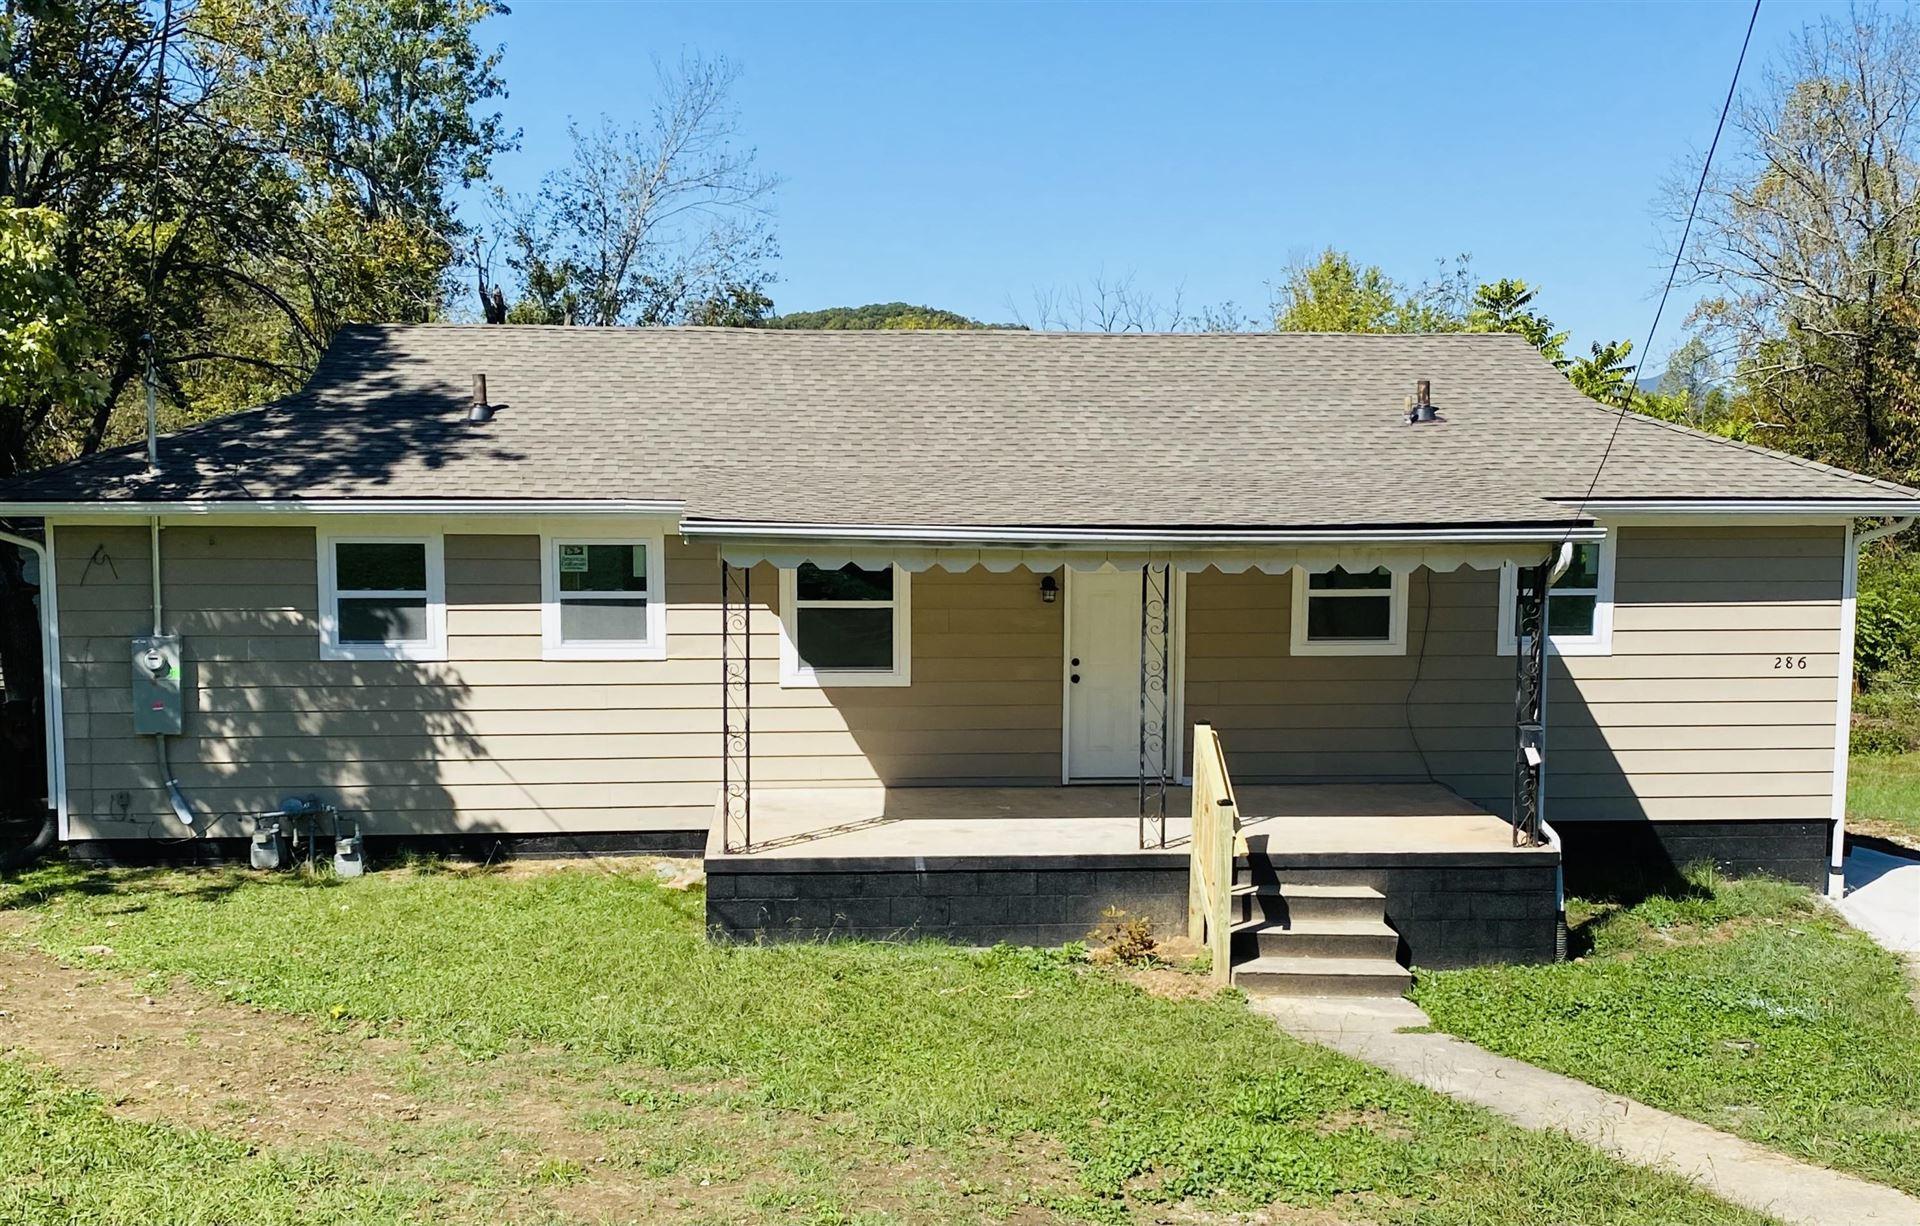 Photo of 286 S Benedict Ave, Oak Ridge, TN 37830 (MLS # 1133094)